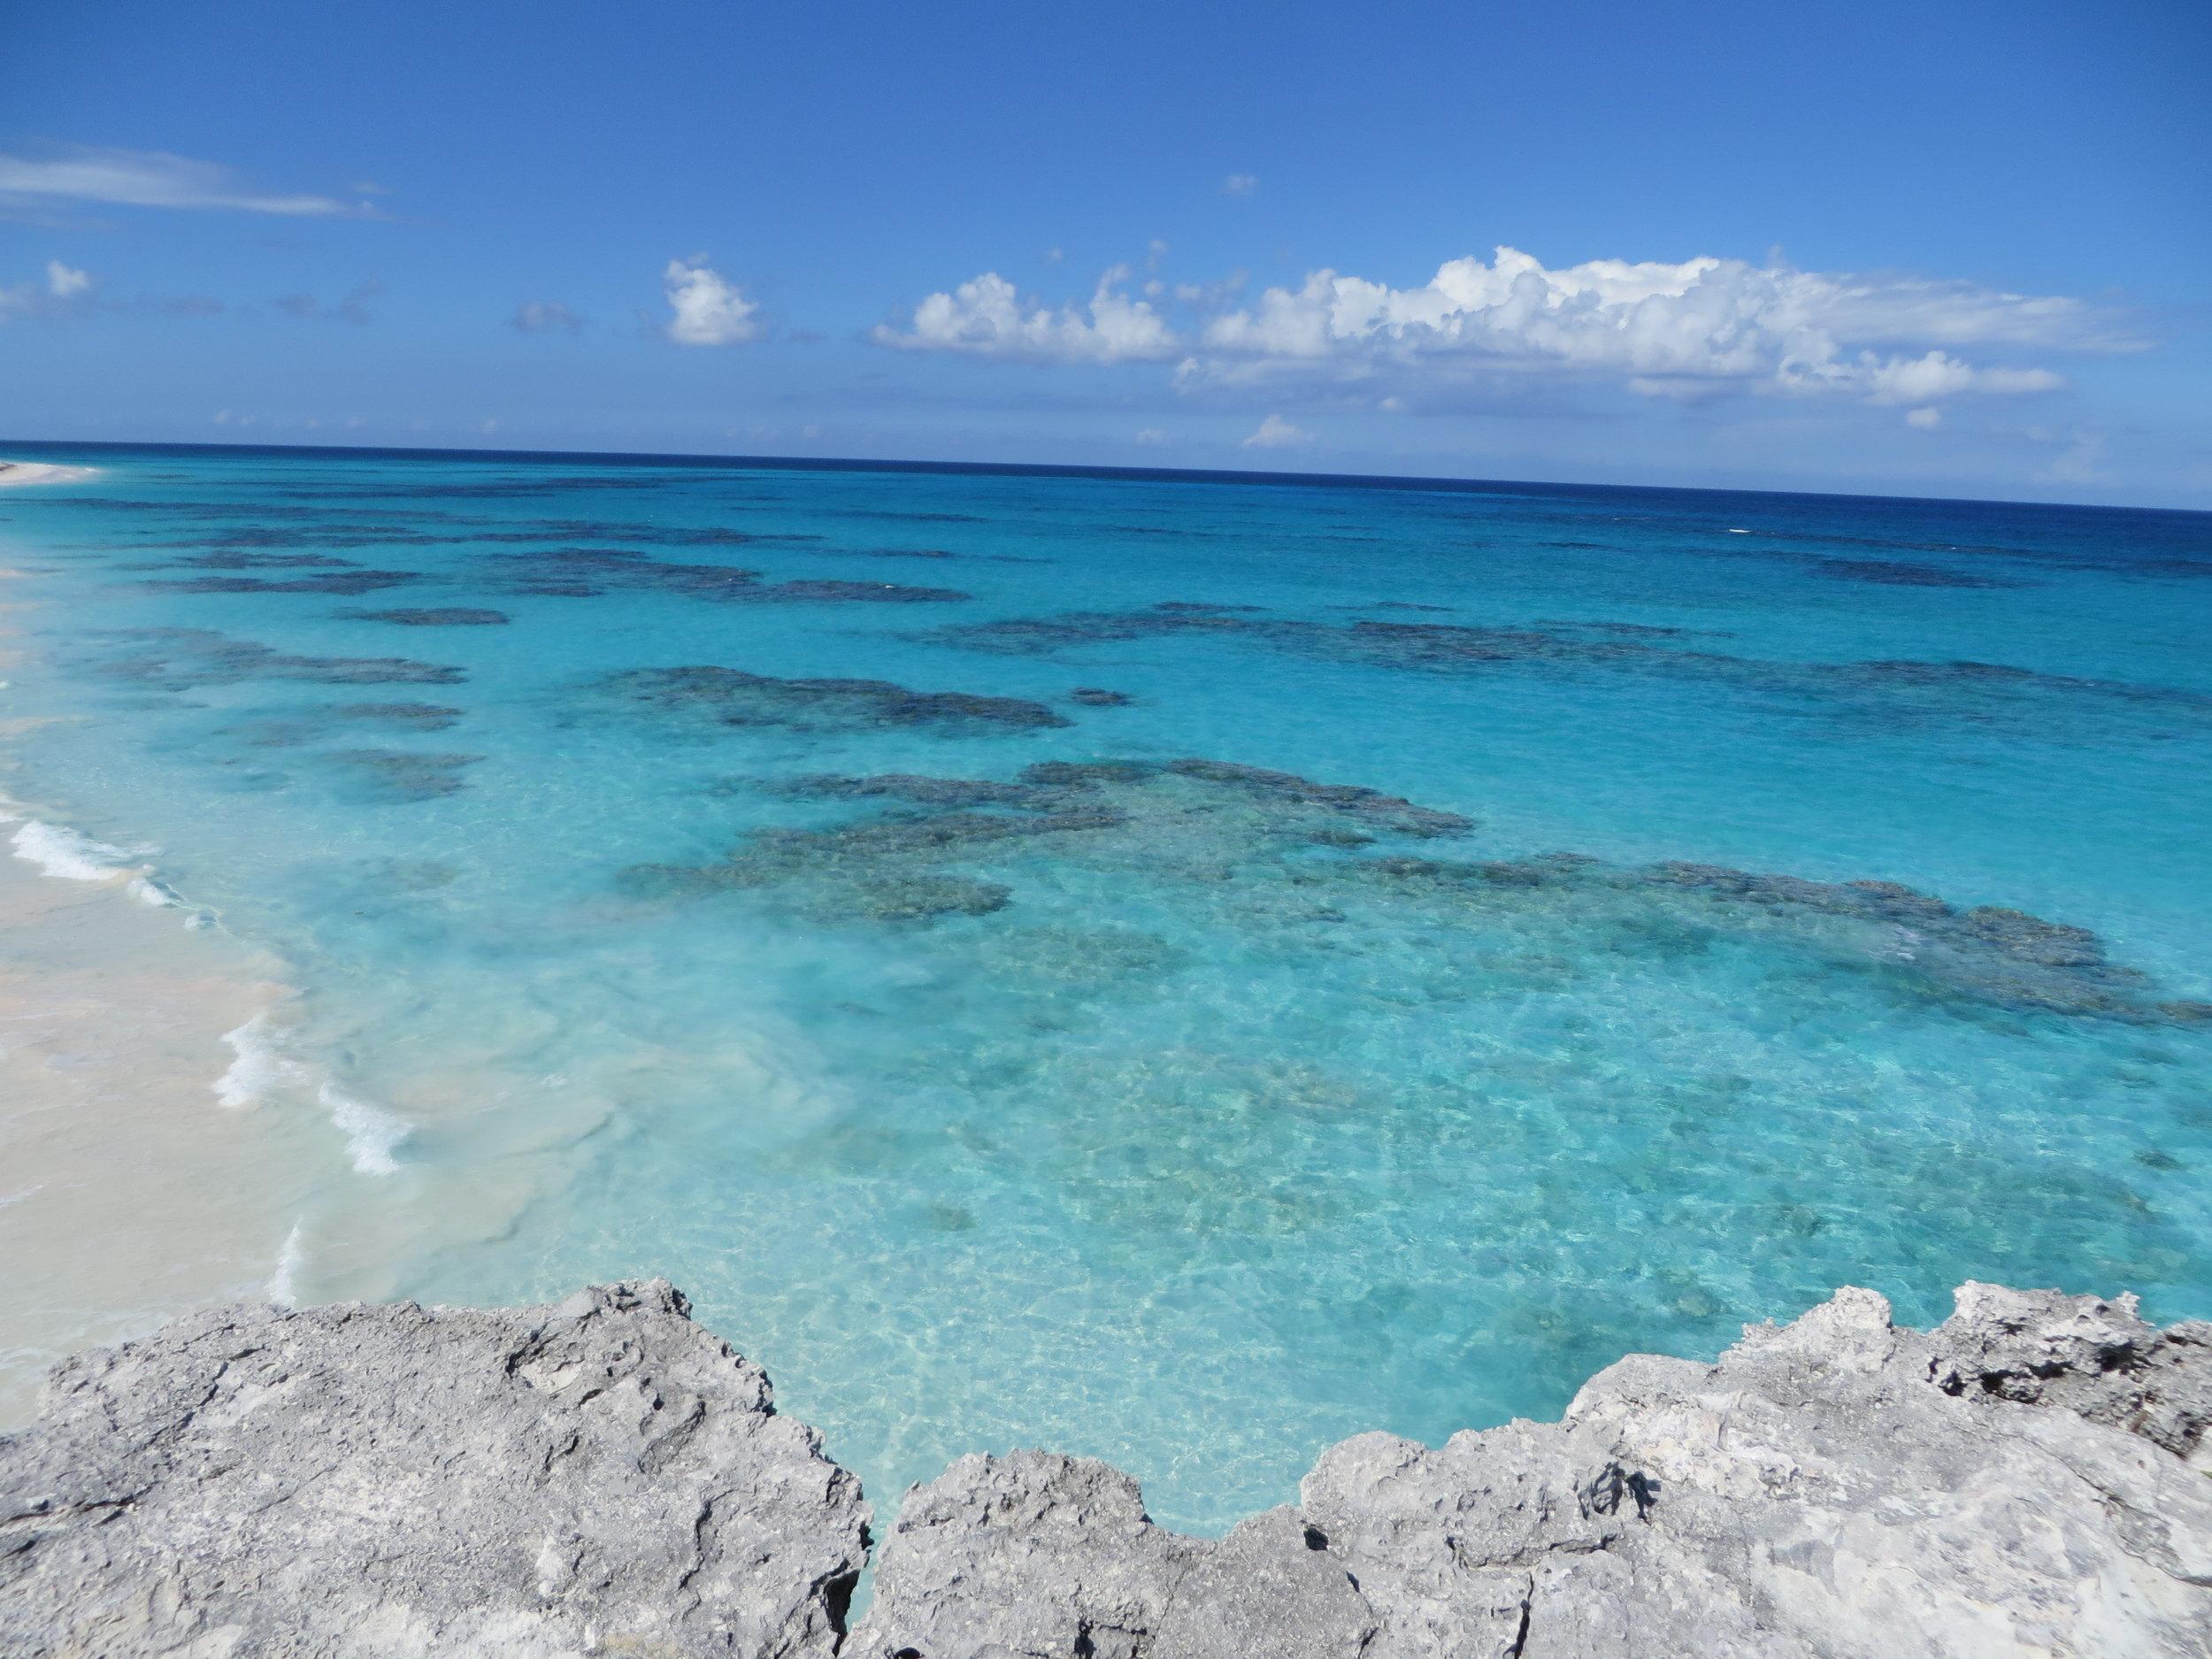 Bahamas (Eleuthera) - Peak Season: Dec-AprVibe: #Adventure #Surf&Snorkel #Culture #OffTheGridCOMING SOON!